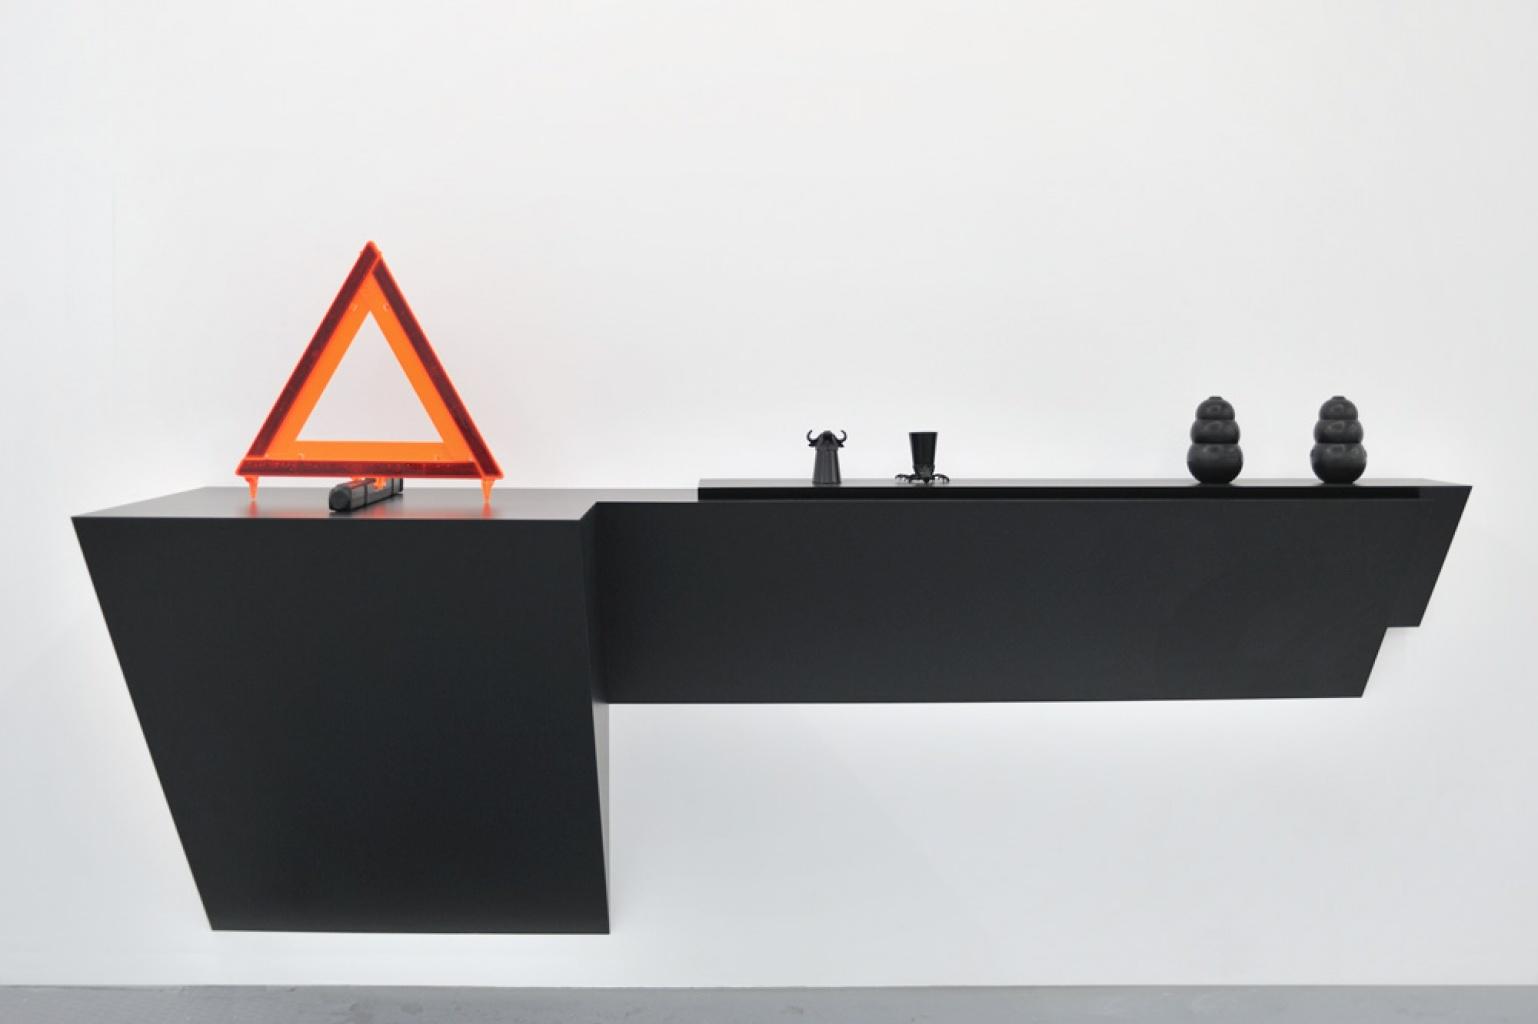 Haim Steinbach (2009) Untitled (emergency sign, short glasses, dog chews). Plastic laminated wood shelf, plastic emergency sign, 2 glass and metal shot glasses, 2 rubber dog chews. 125.7 x 222.3 x 68.6.